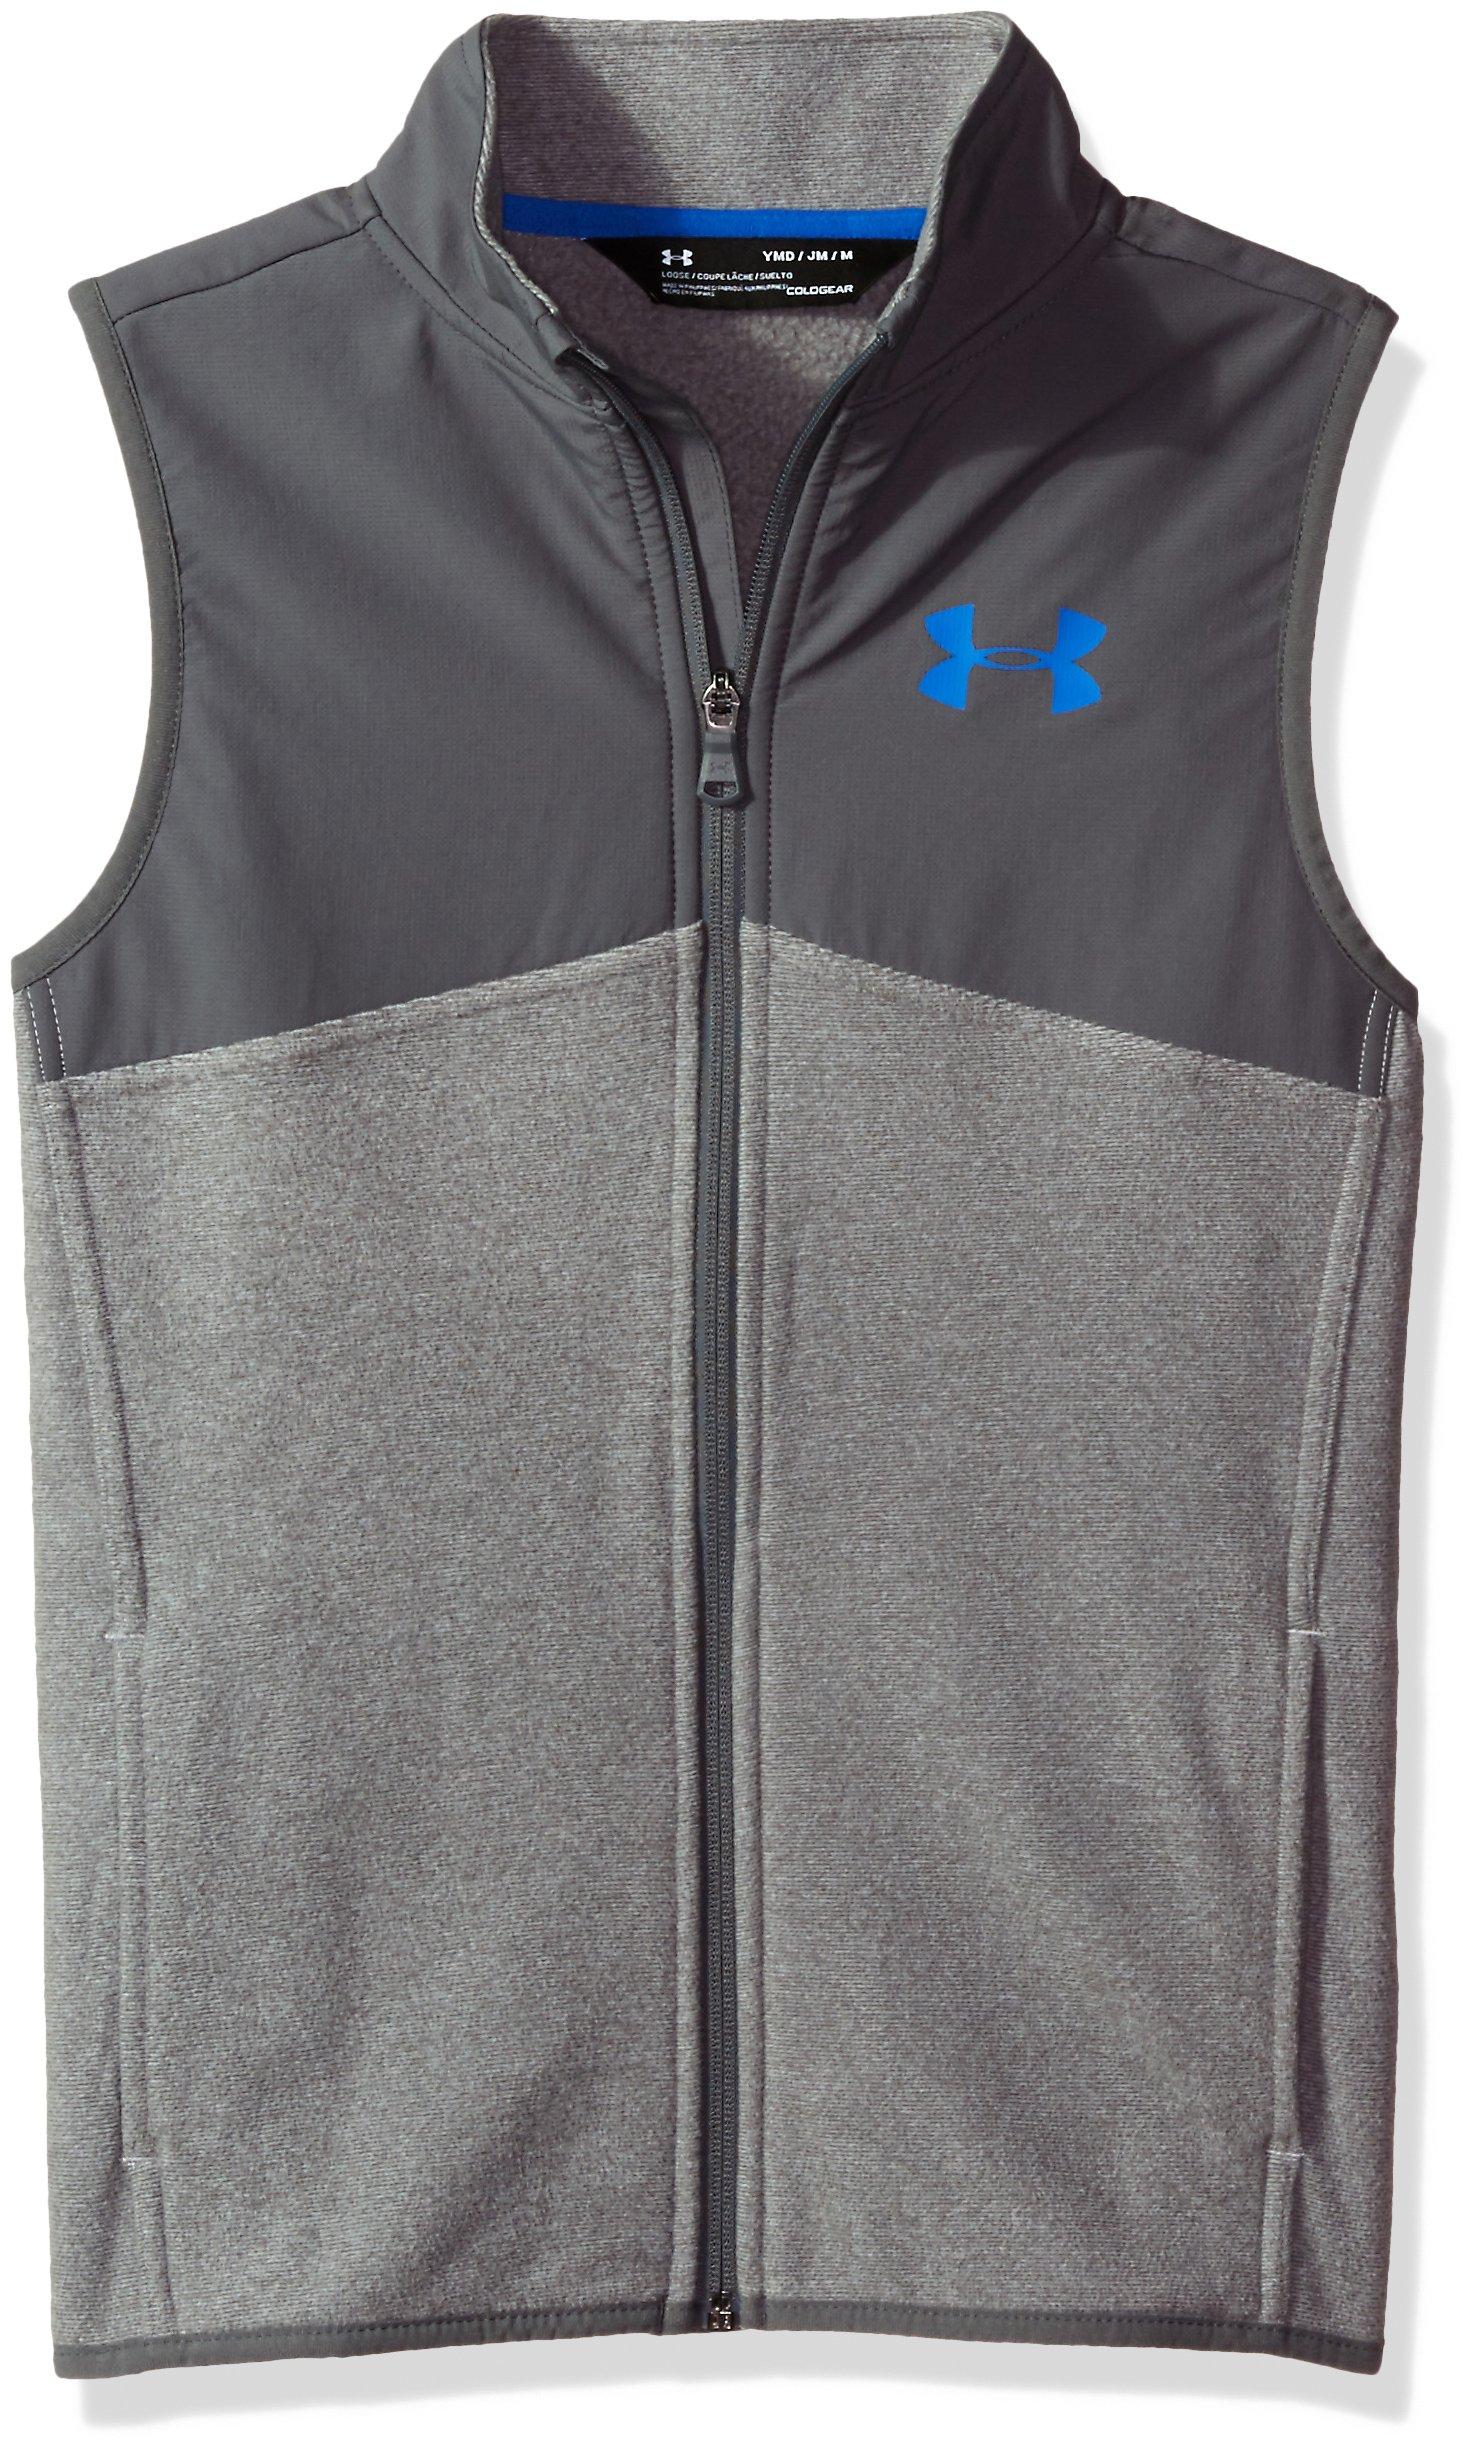 Under Armour Boys' Phenom Vest,Graphite (040)/Ultra Blue, Youth X-Large